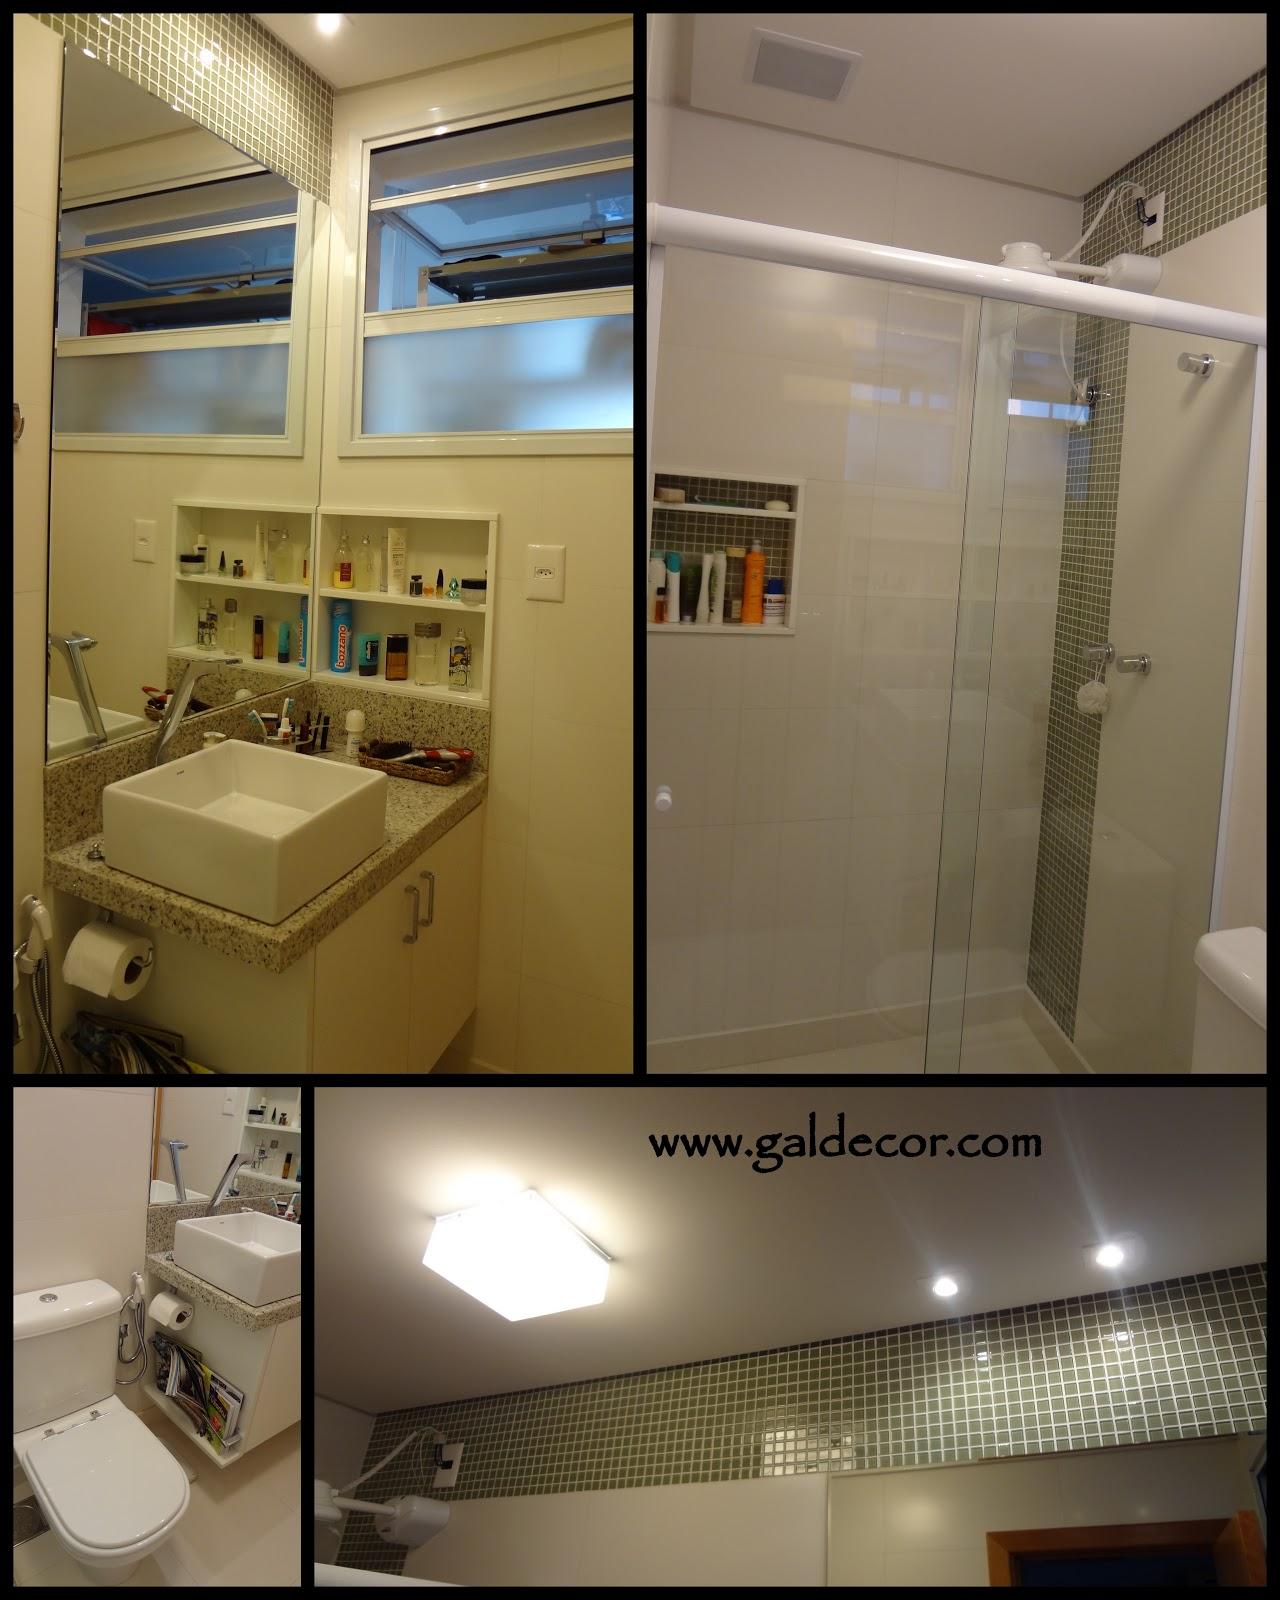 Imagens de #3C6D8F 1000  images about Banheiros on Pinterest Toilets Madeira and  1280x1600 px 2826 Box Banheiro Light